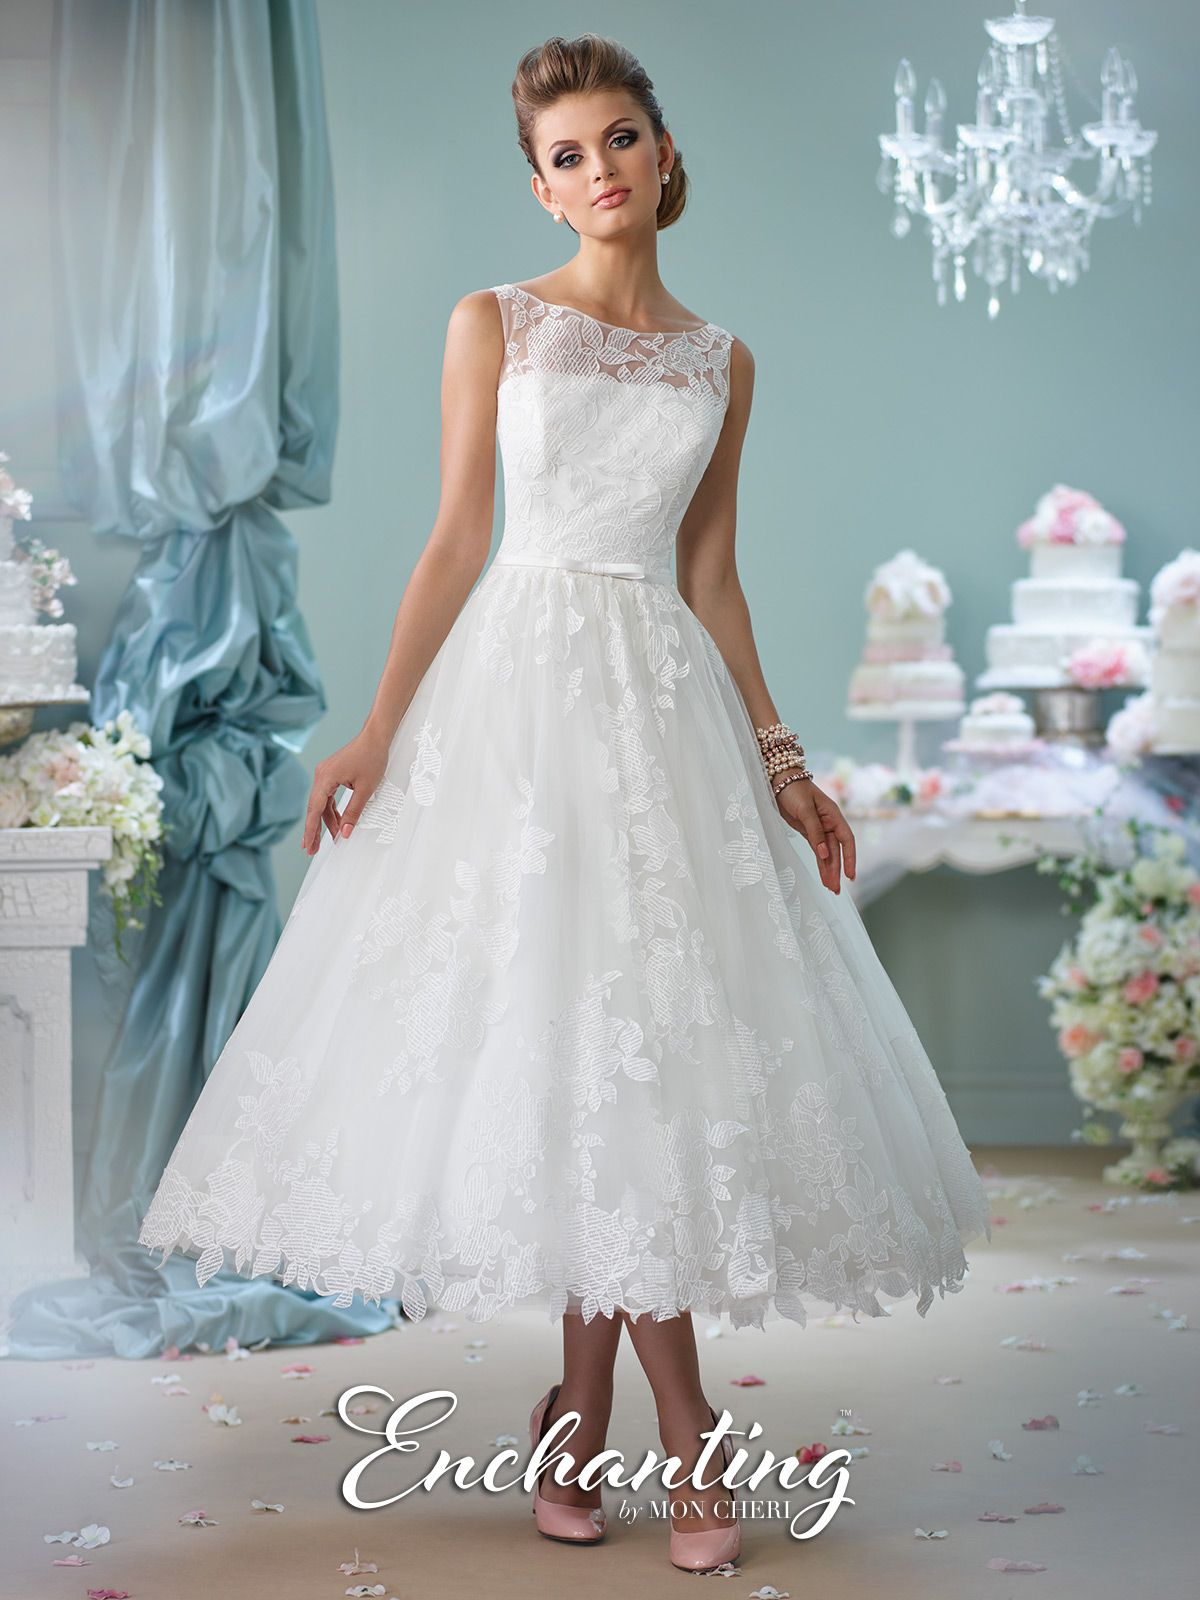 Tea Length Modest Wedding Dress- 116136 Enchanting by Mon Cheri ...